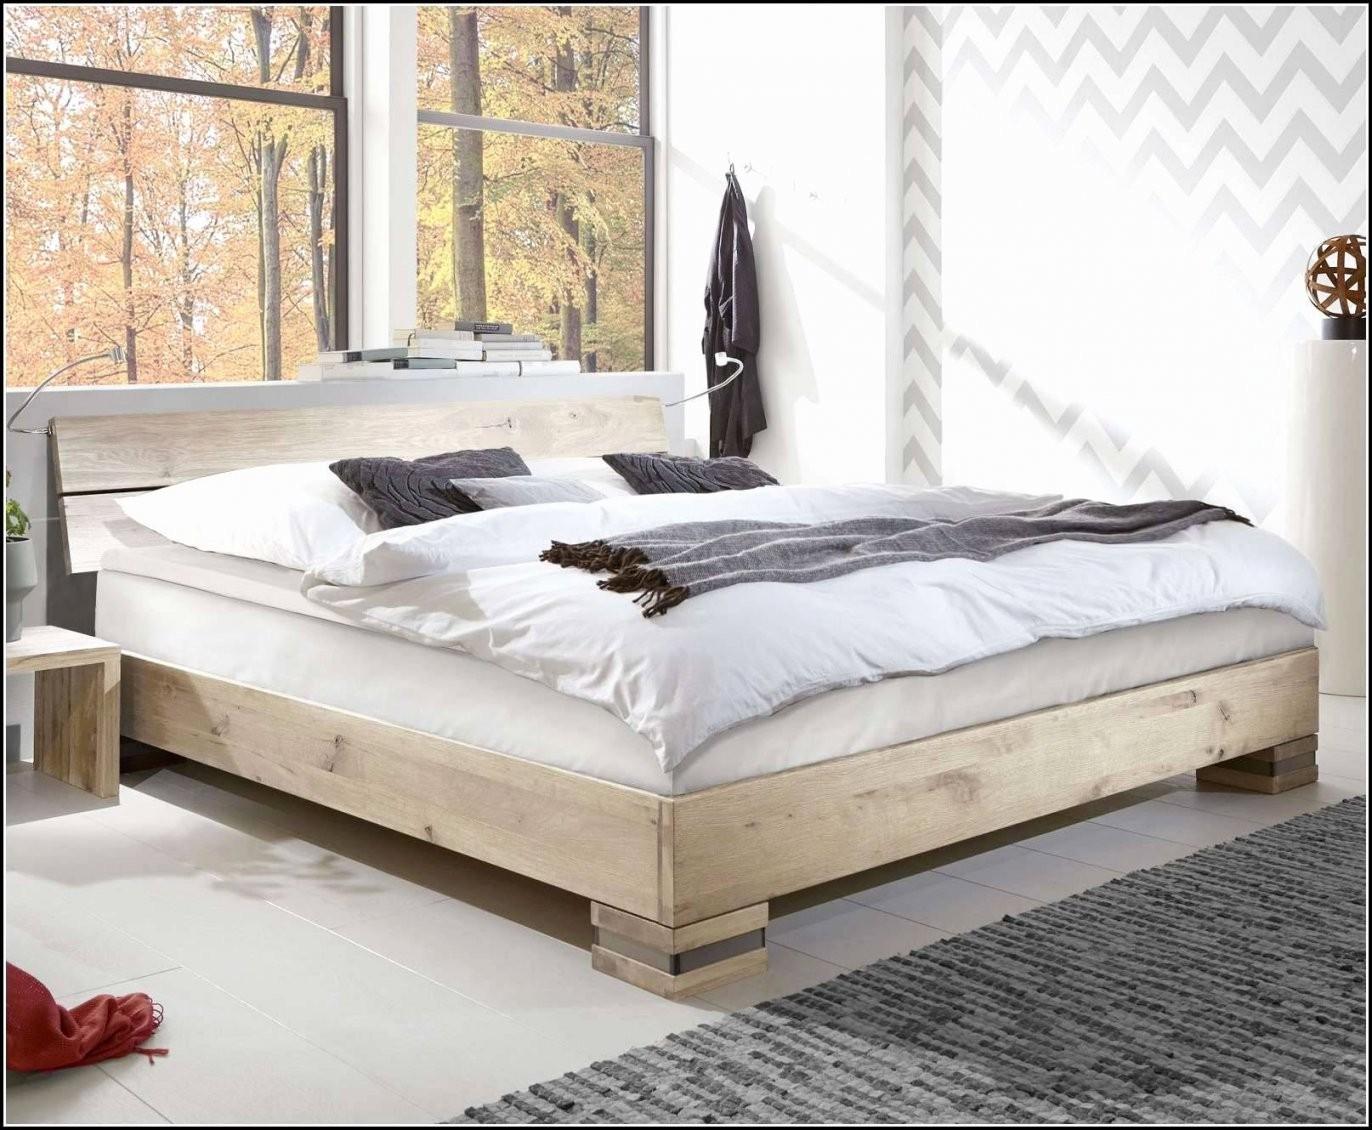 Stabiles Bett 140×200 Elegant Schlafzimmer Komplett Bett 140×200 von Stabiles Bett 140X200 Photo